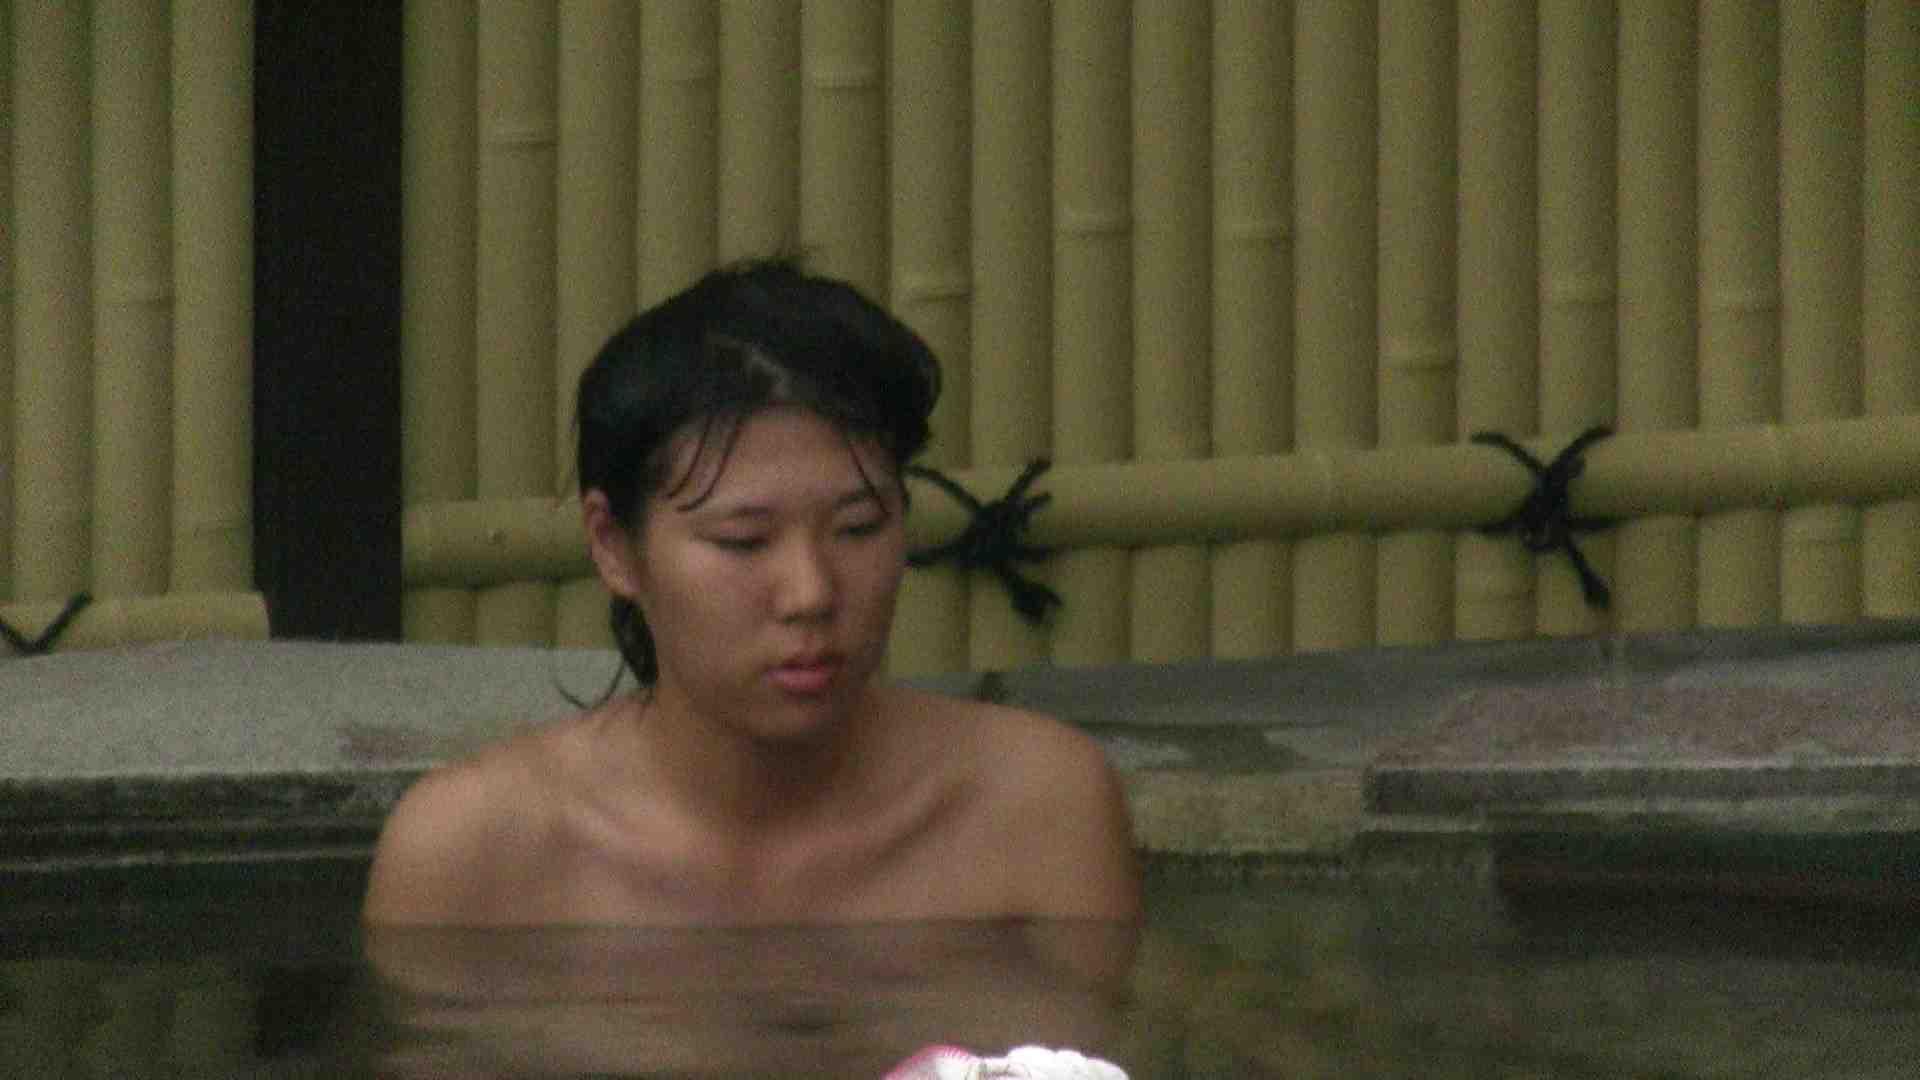 Aquaな露天風呂Vol.215 盗撮 おまんこ無修正動画無料 106枚 23